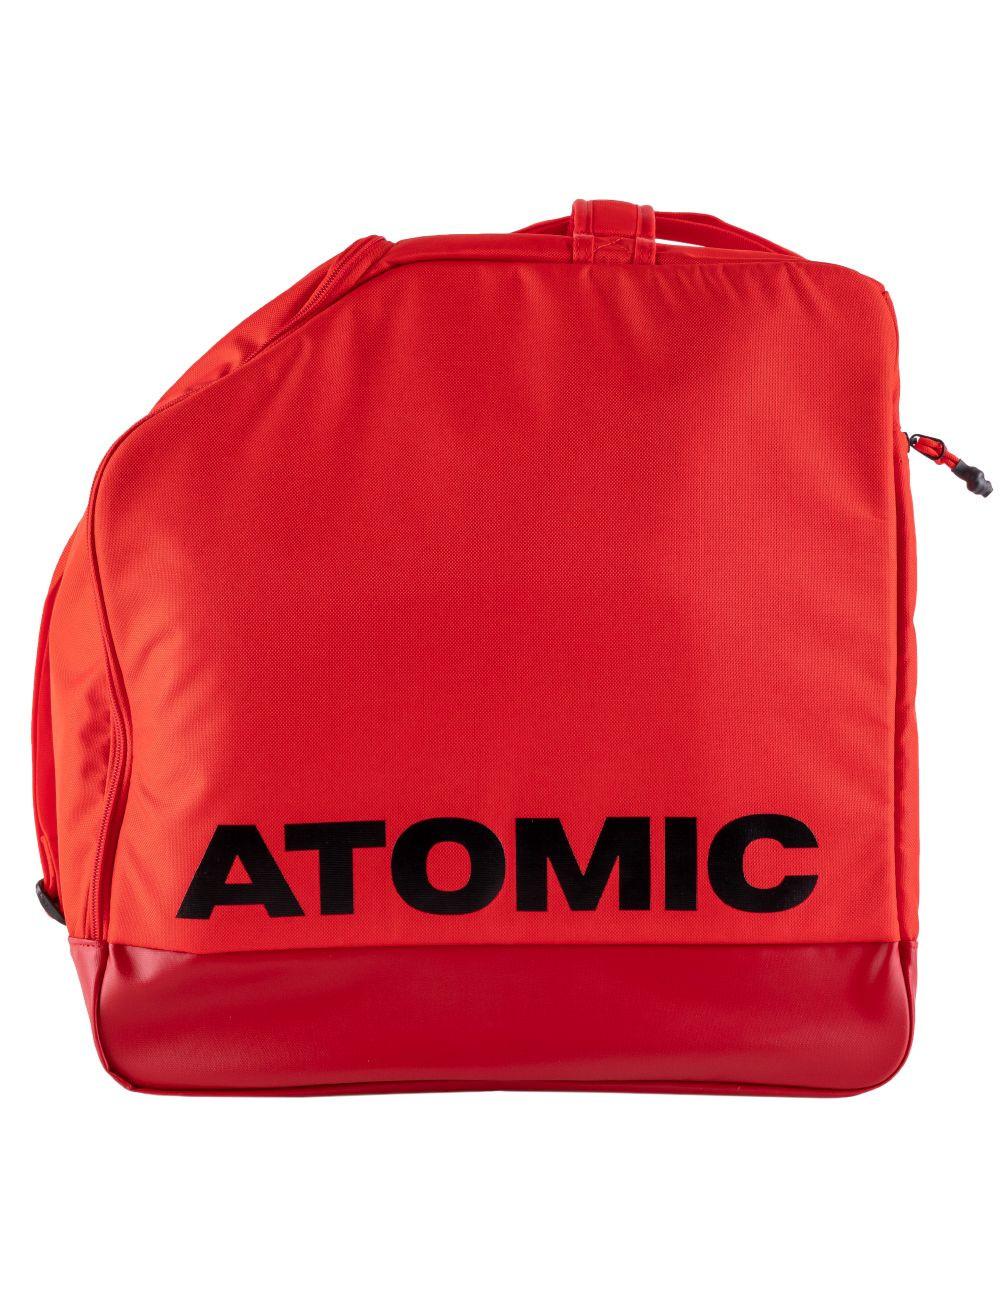 Torba na buty i kask Atomic Boot & Helmet Bag